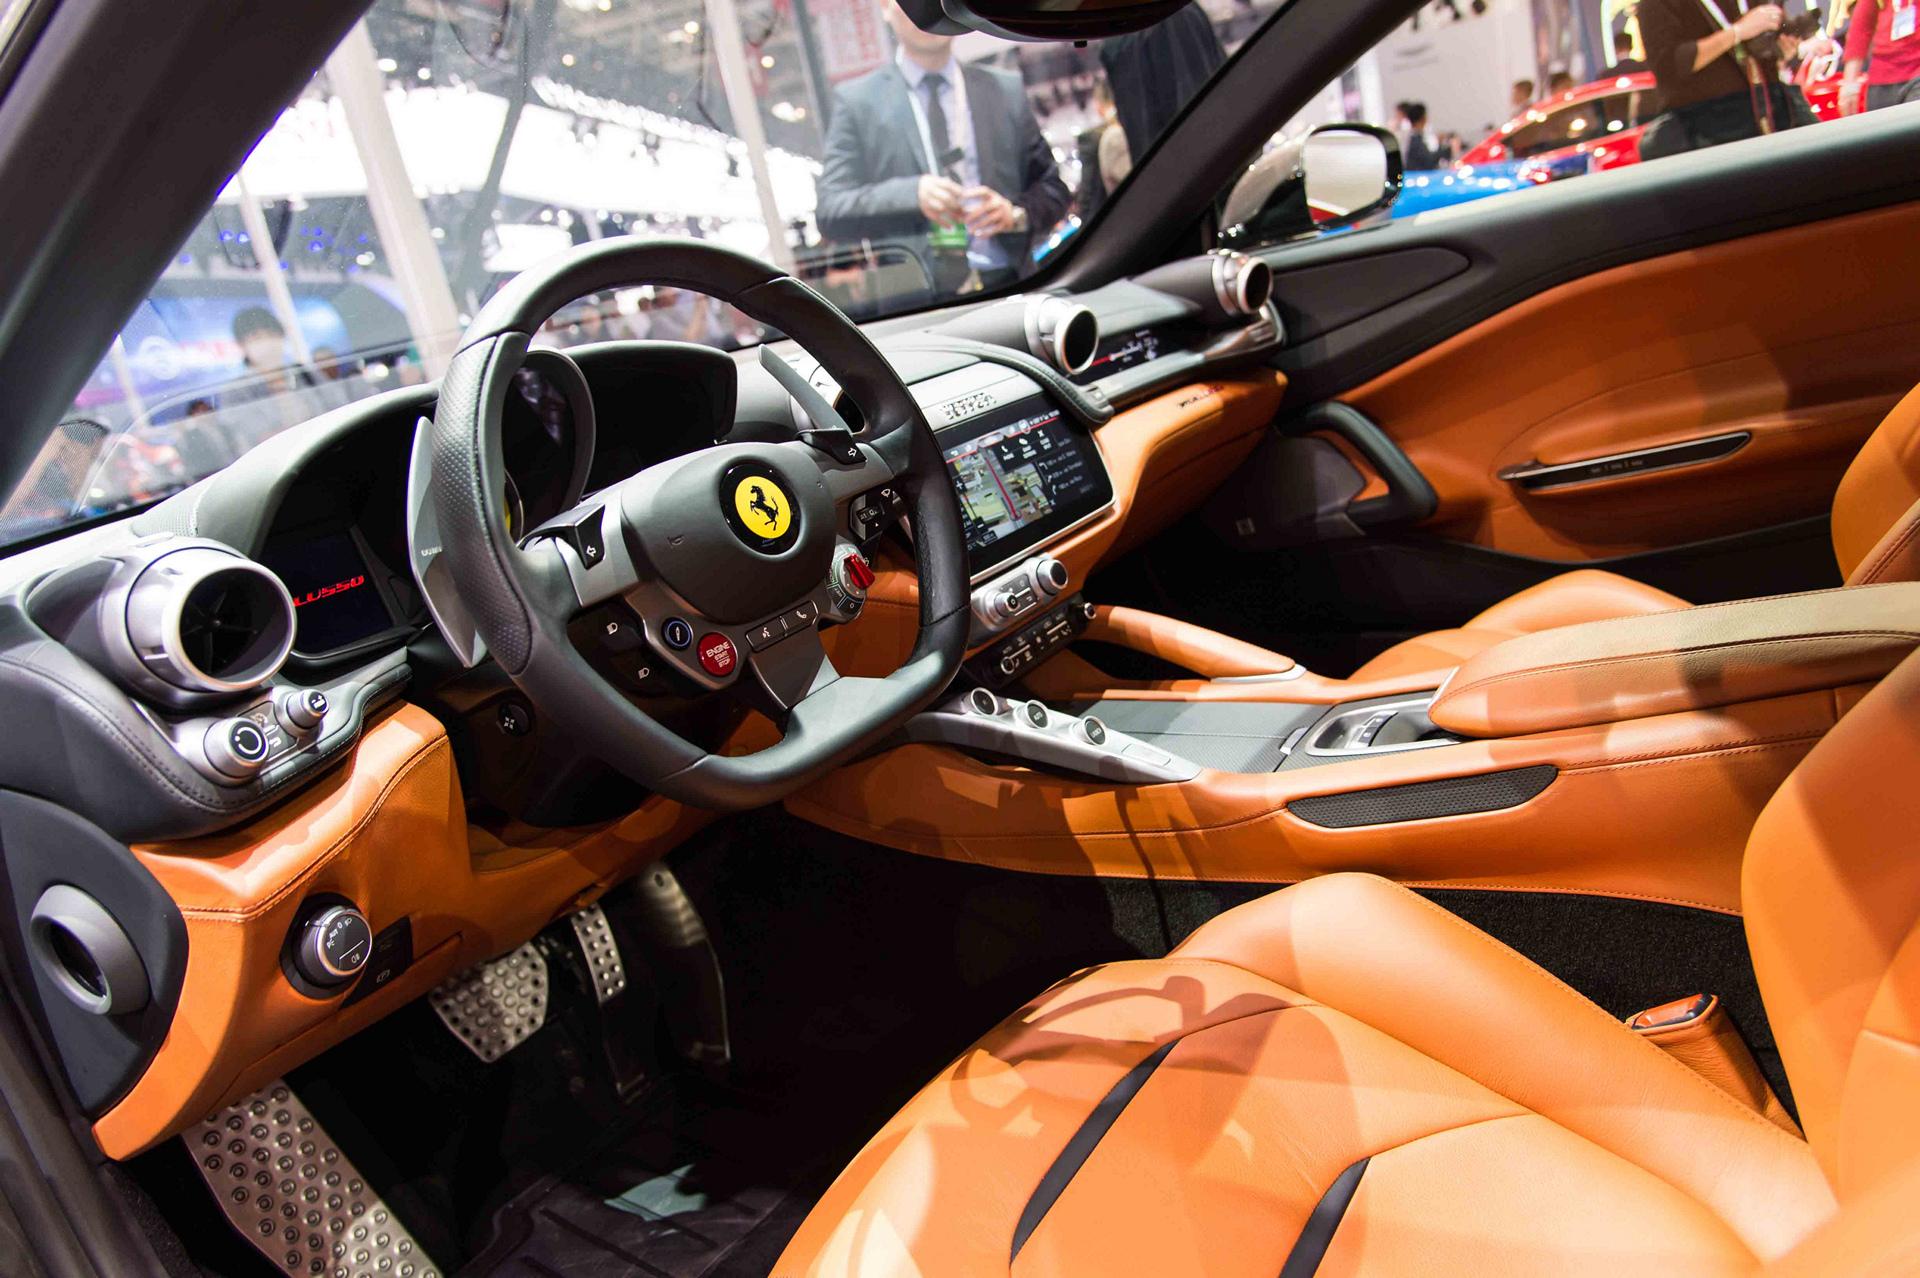 ferrari unveils the all new gtc4lusso in china carrrs auto portal. Black Bedroom Furniture Sets. Home Design Ideas